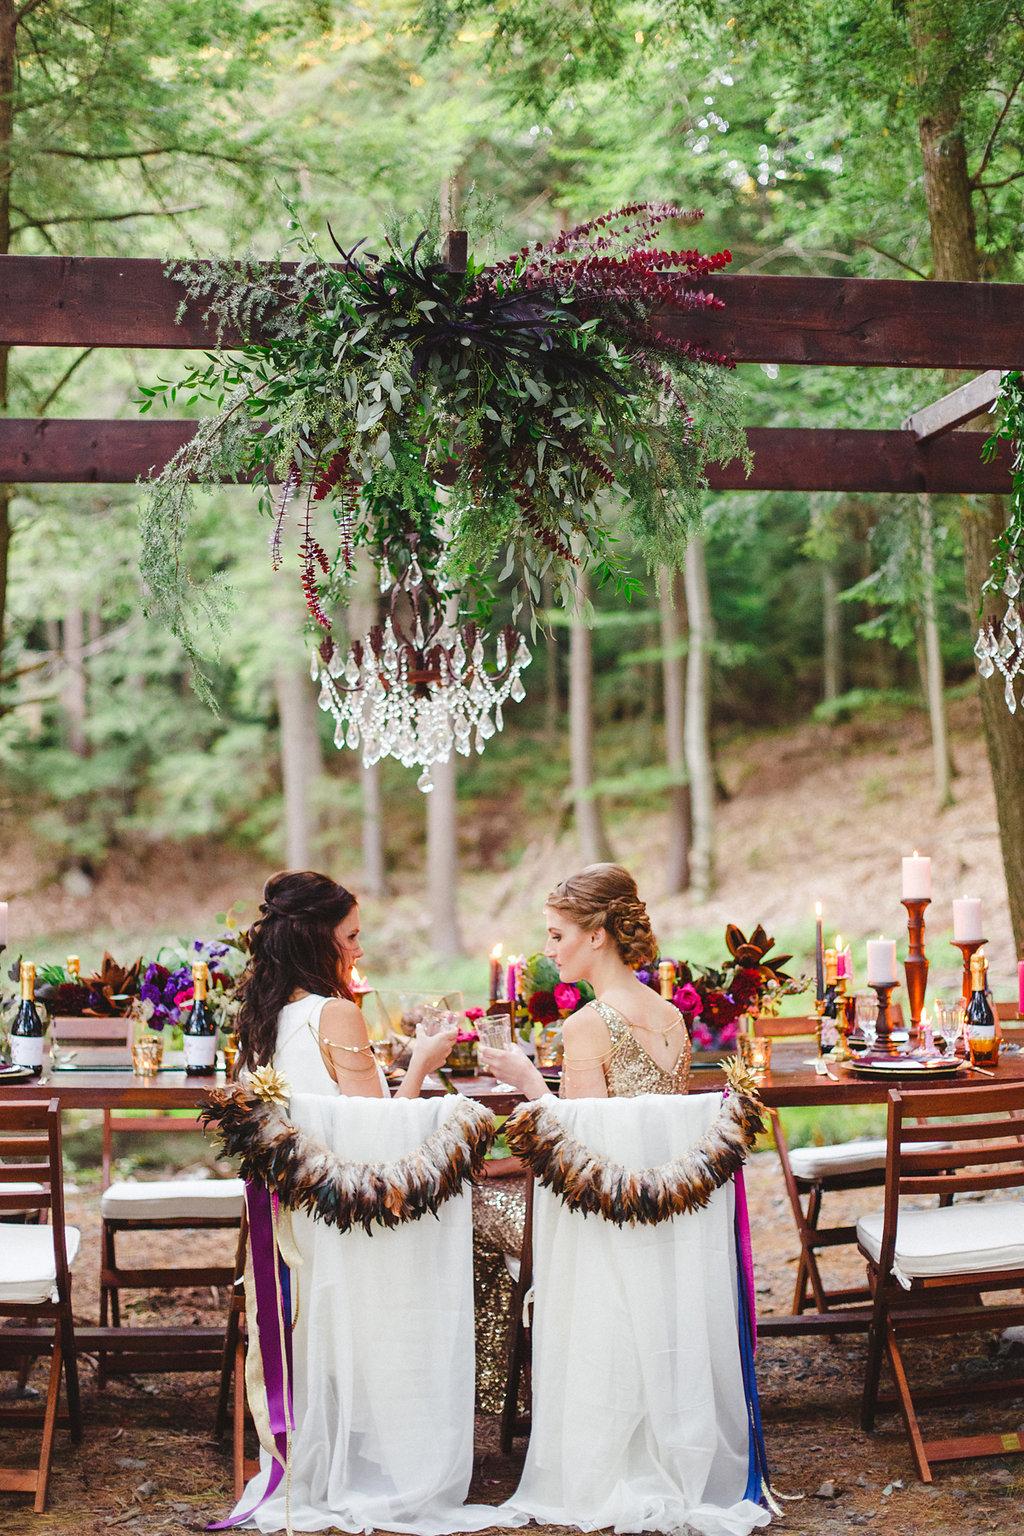 Jewel_Tone_Bohemian_Wedding_Magnolia_Studios-058.jpg